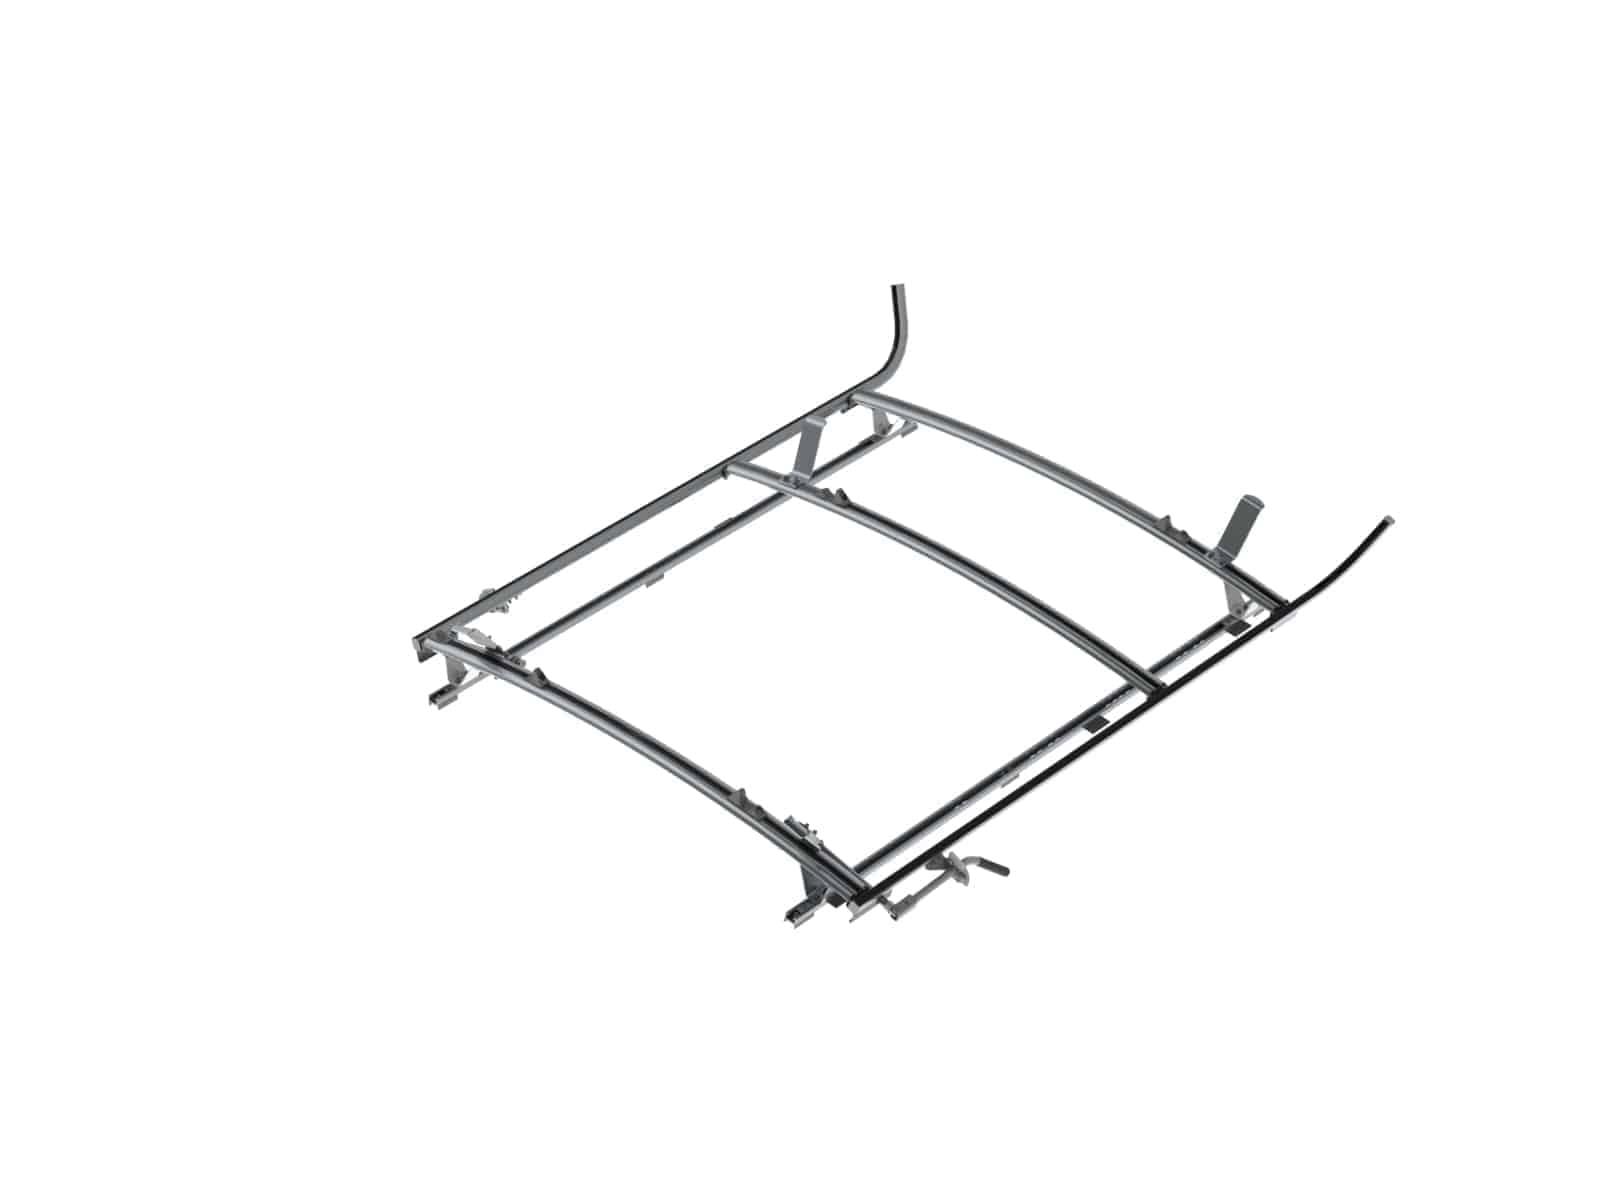 Combination Ram Promaster Ladder Rack 2 Bar System